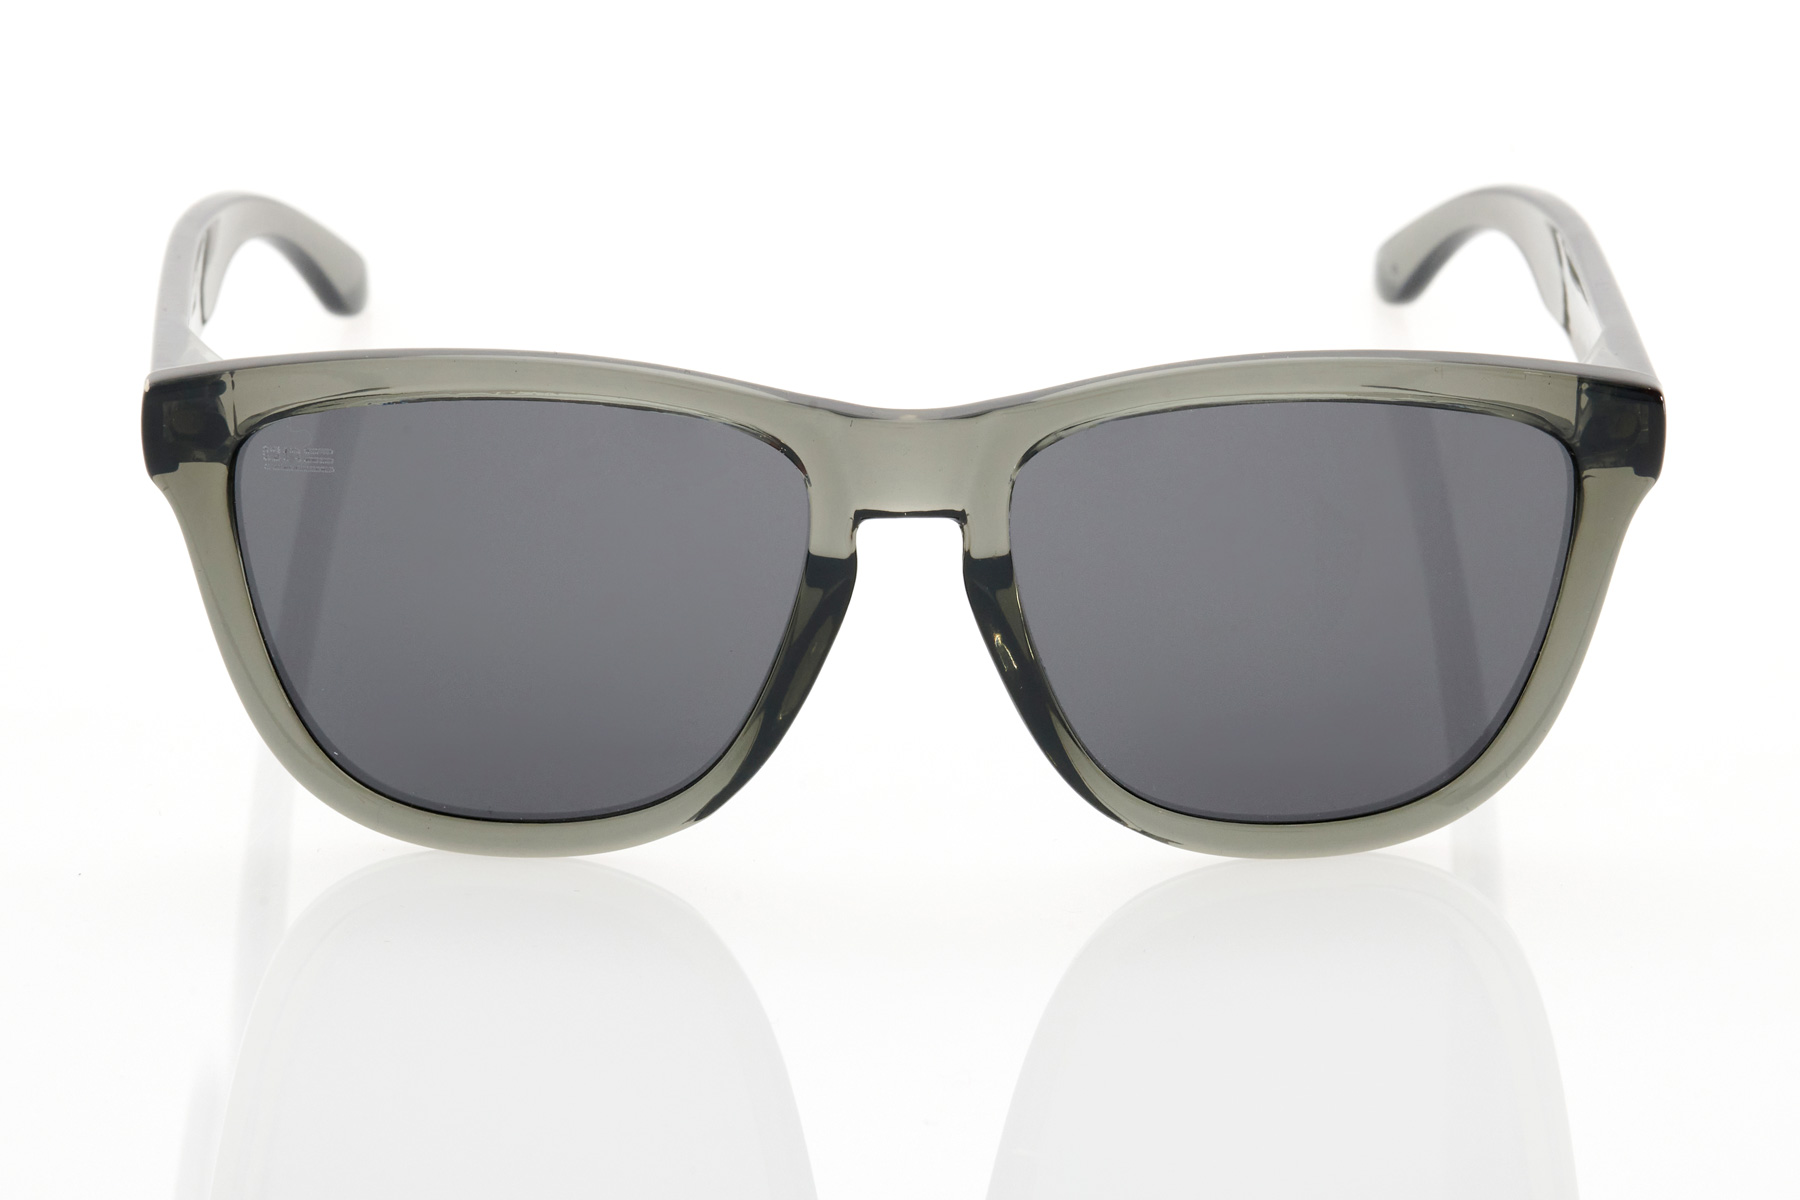 Grey Unisex Sunglasses Hawkers Crystal Black Dark One